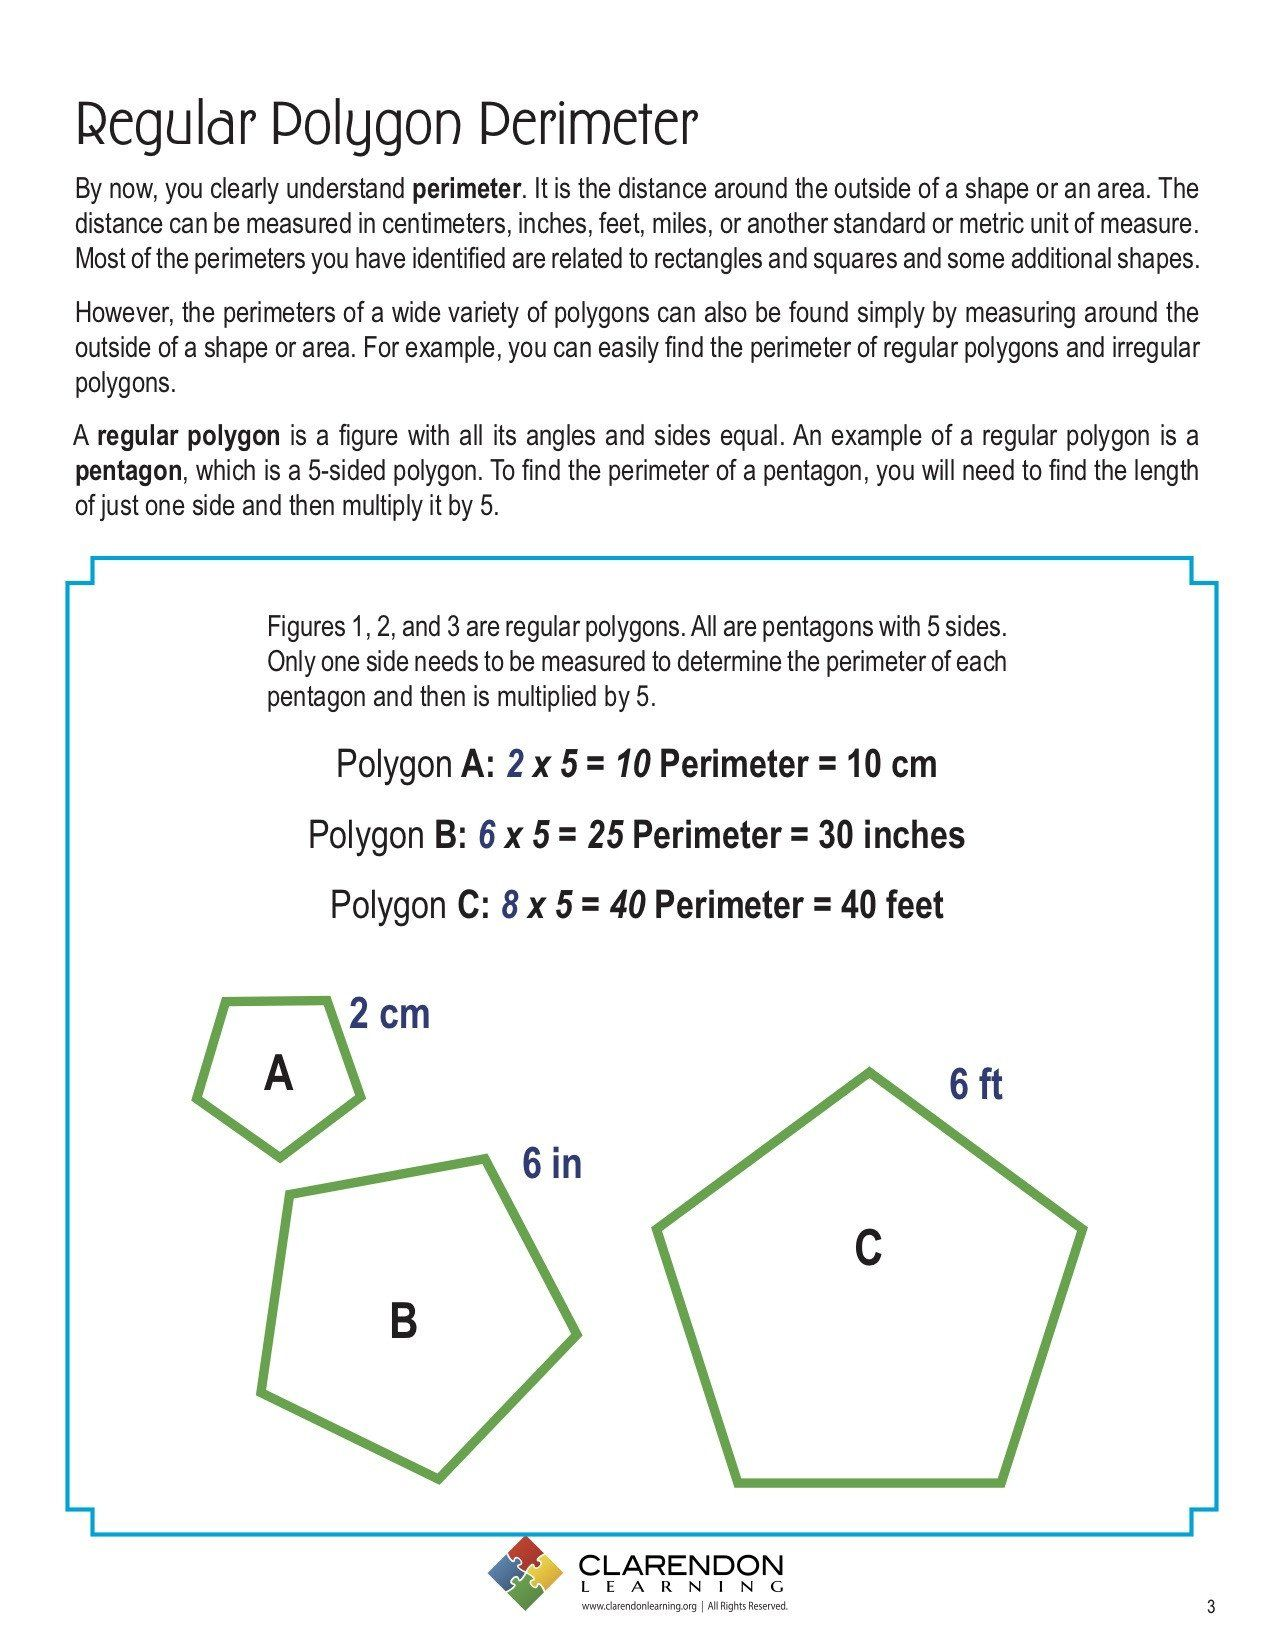 Perimeter Of Irregular Shapes Worksheet Perimeters Of Polygons Lesson Plan In 2020 Regular Polygon Kindergarten Spelling Words Writing Sentences Worksheets